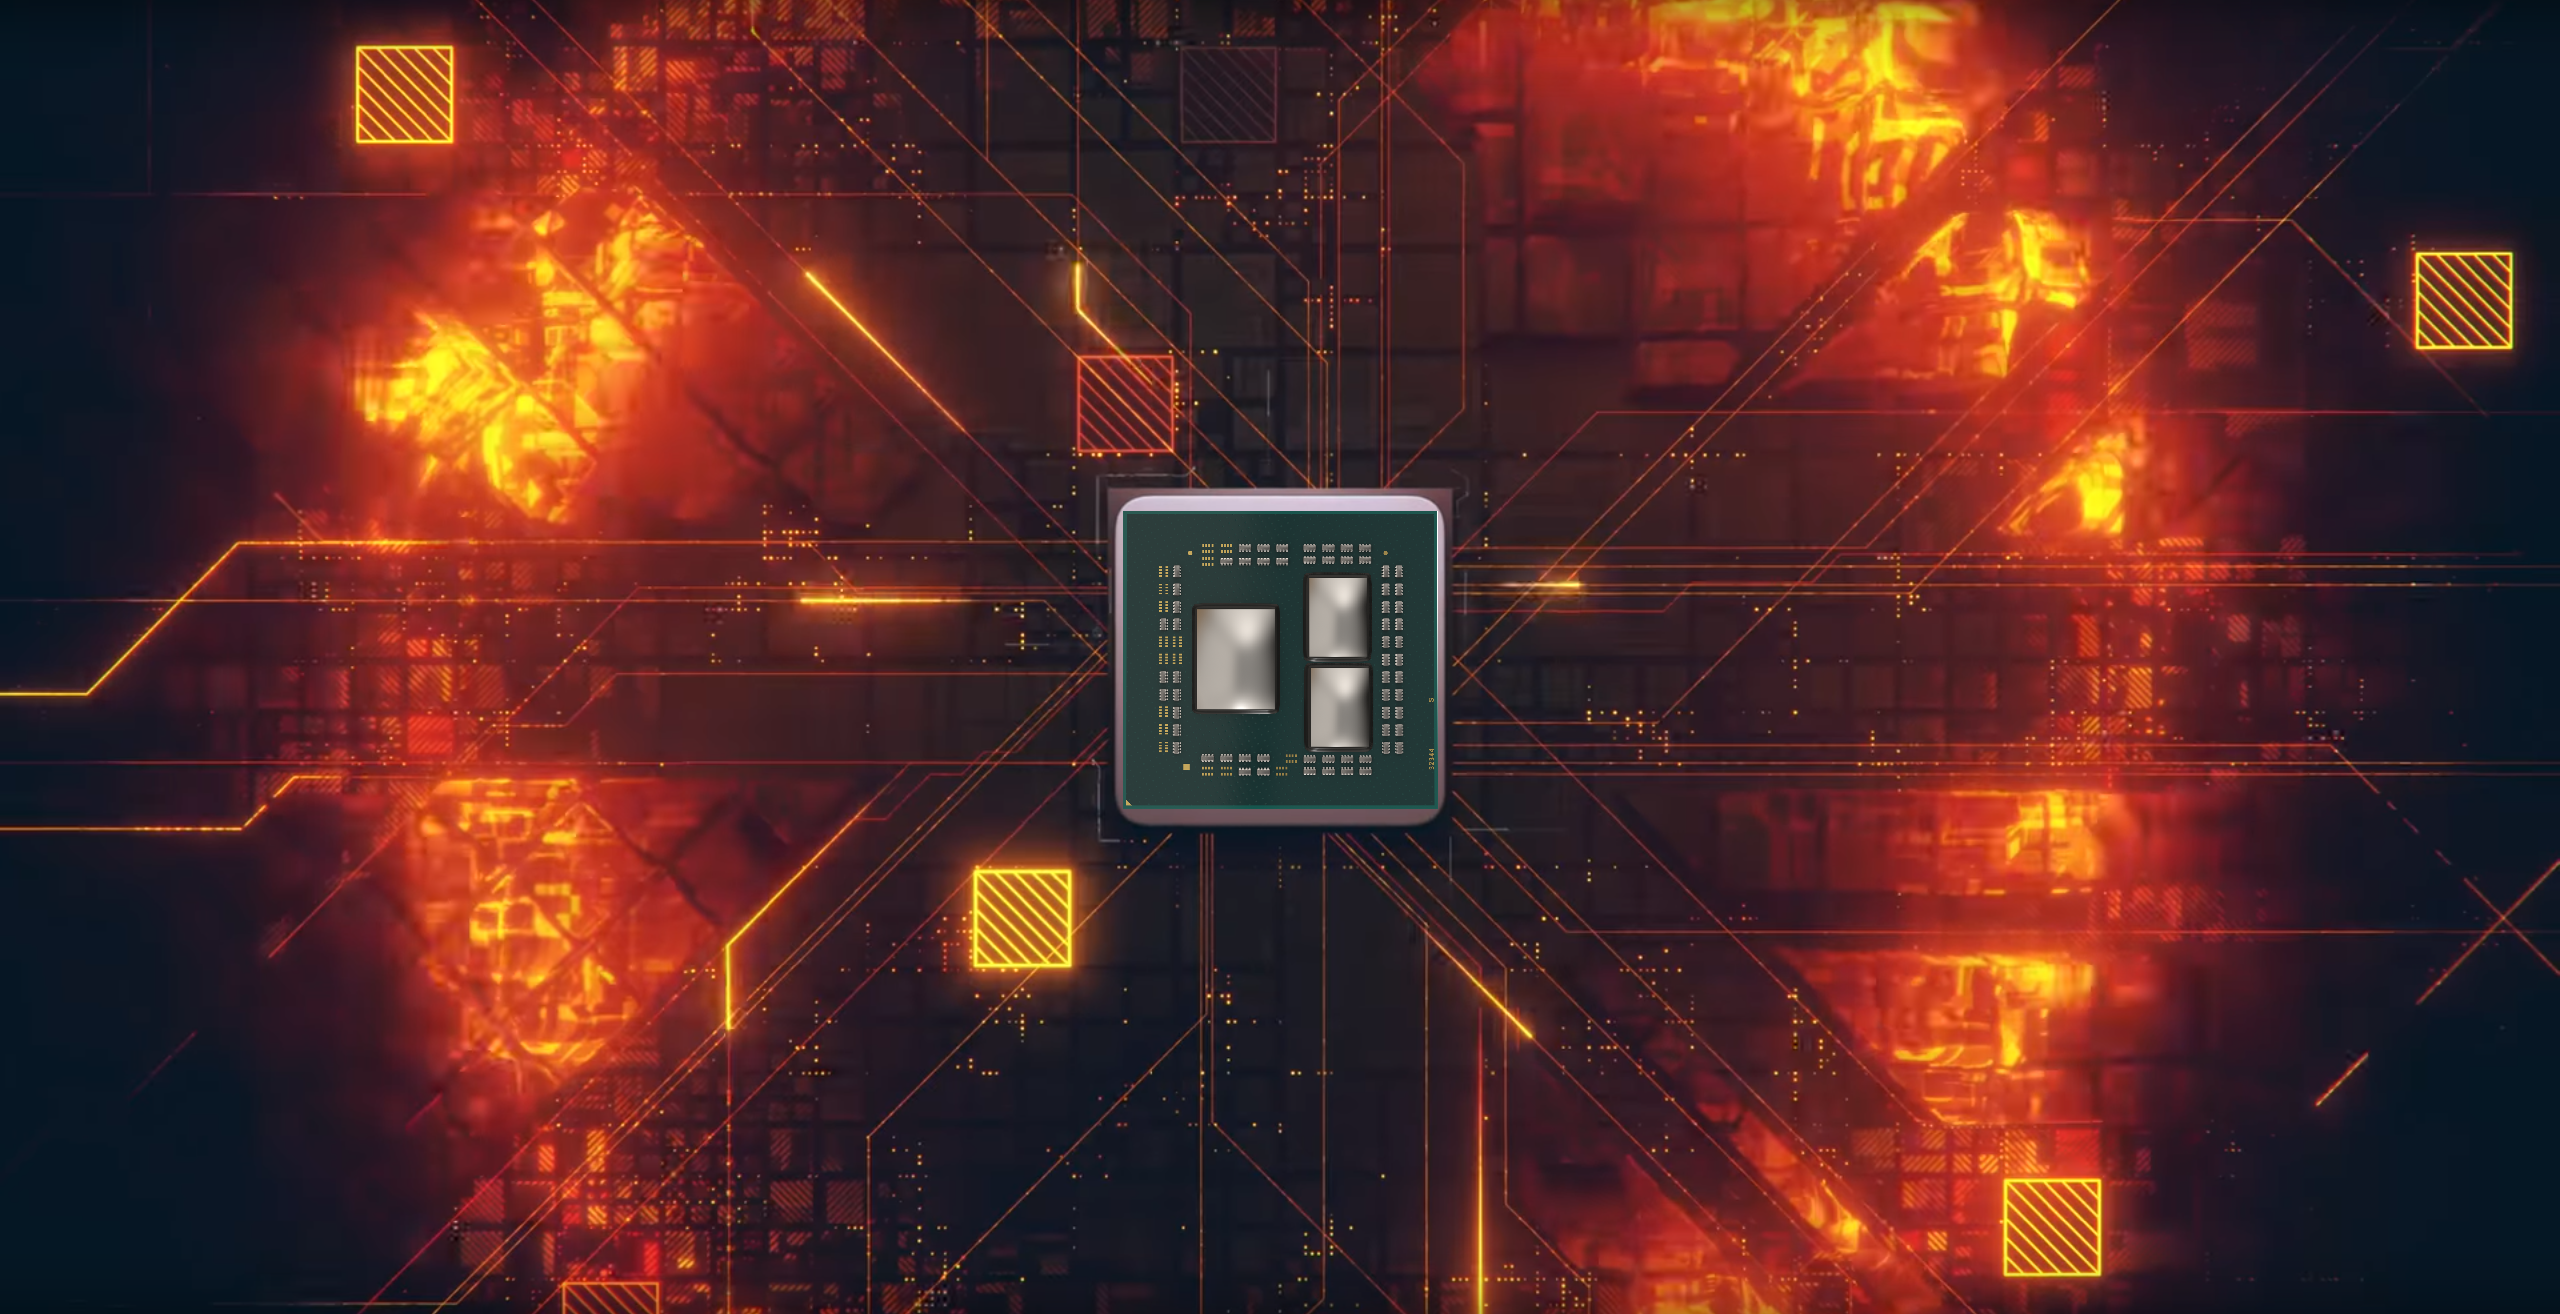 AMD Zen 2 6 Core CPU Benchmark Leaked, Faster Than Ryzen 7 2700X in Geekbench 4